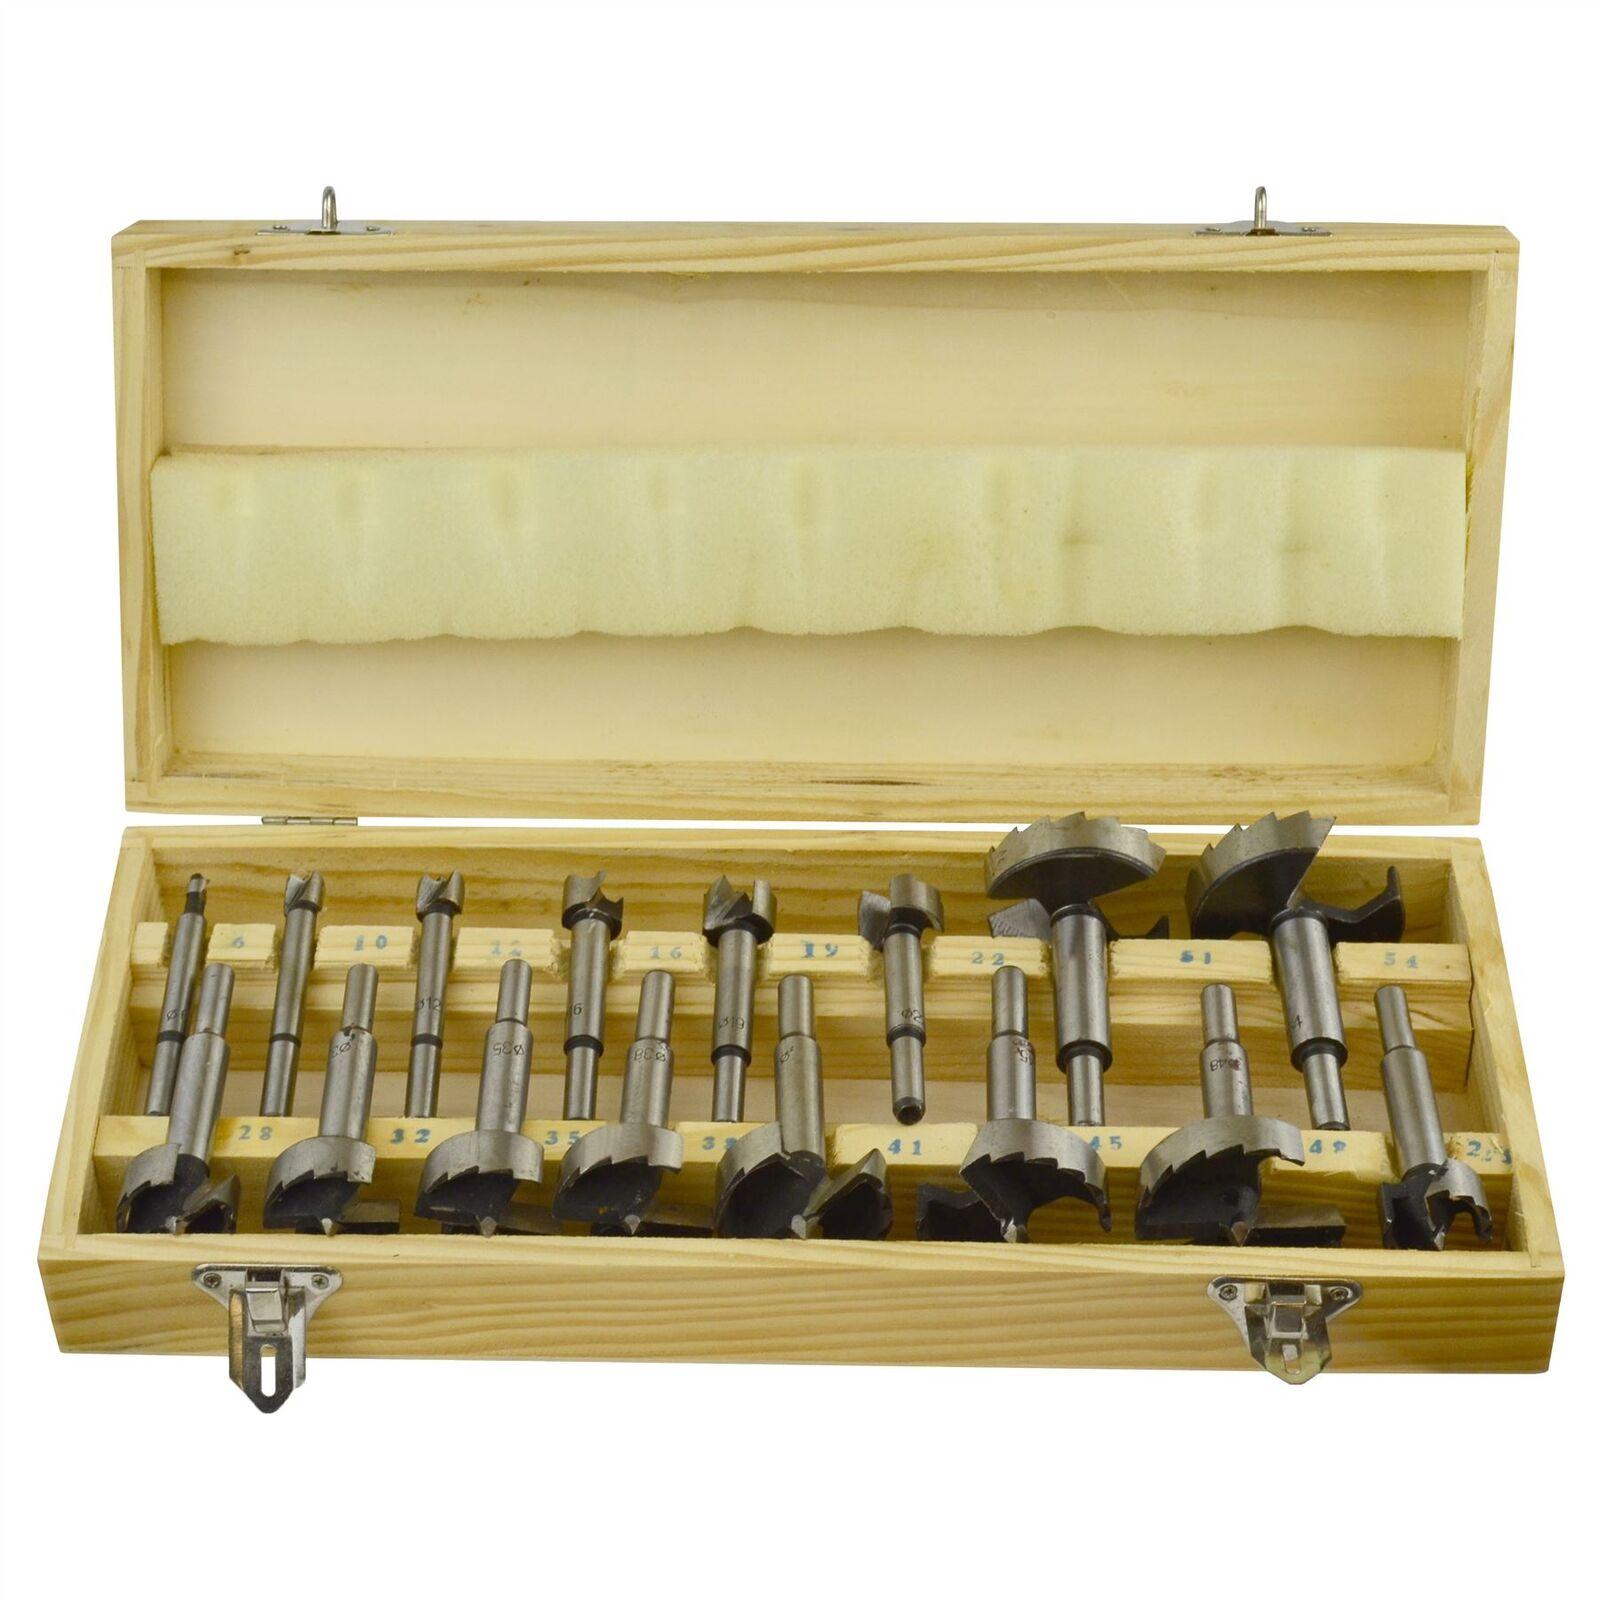 16PC Juego de brocas Forstner de brocas para madera     aburrido Juego de punta